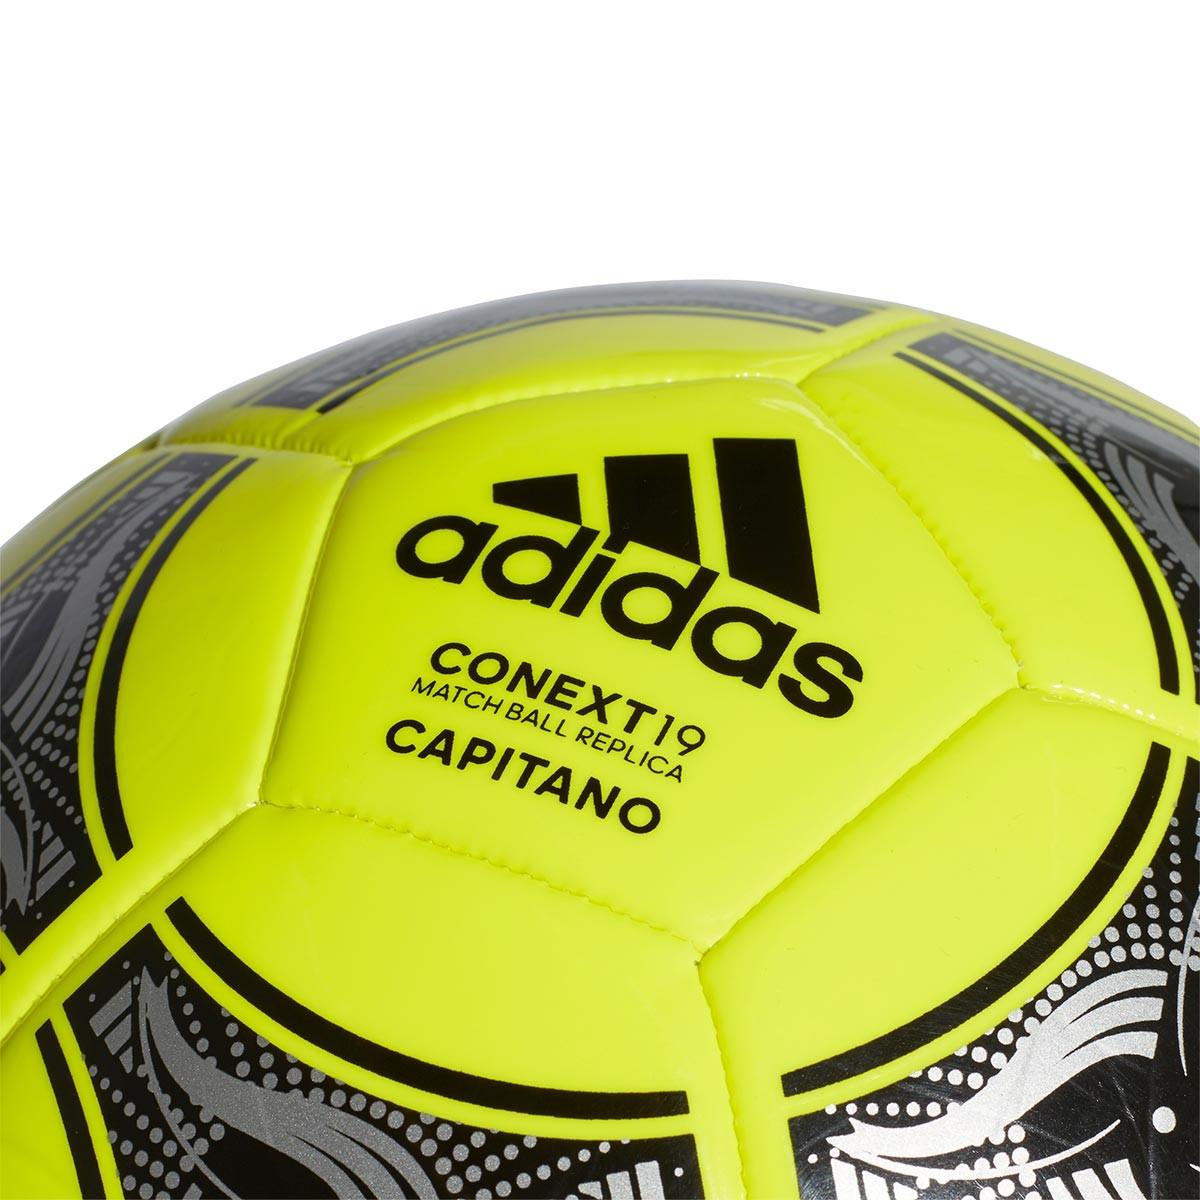 08fa262e7 Ball adidas Conext 19 Capitano Solar yellow-Black-Silver metallic -  Football store Fútbol Emotion